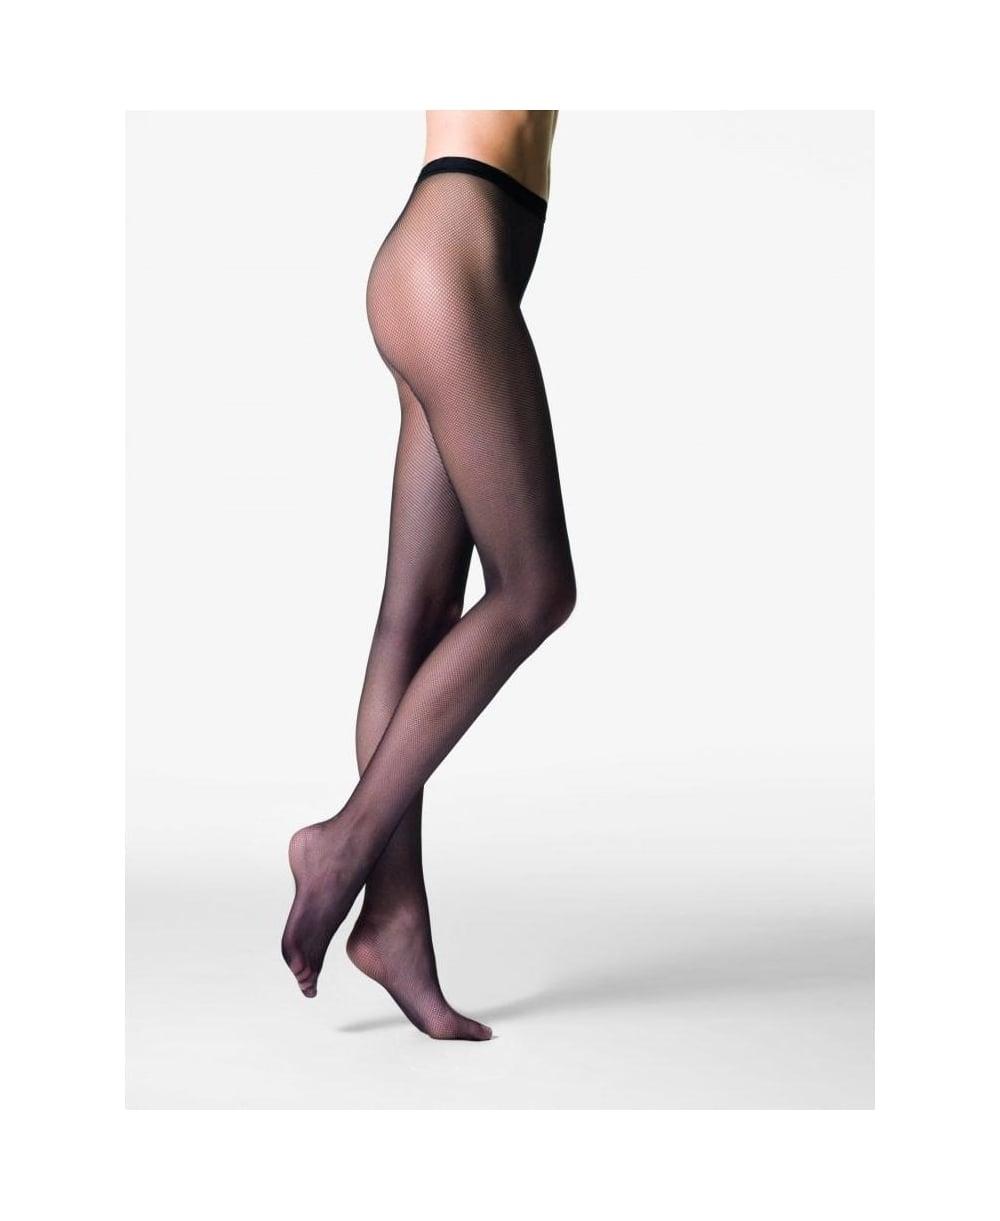 Leggs lowrise pantyhose hot.. like